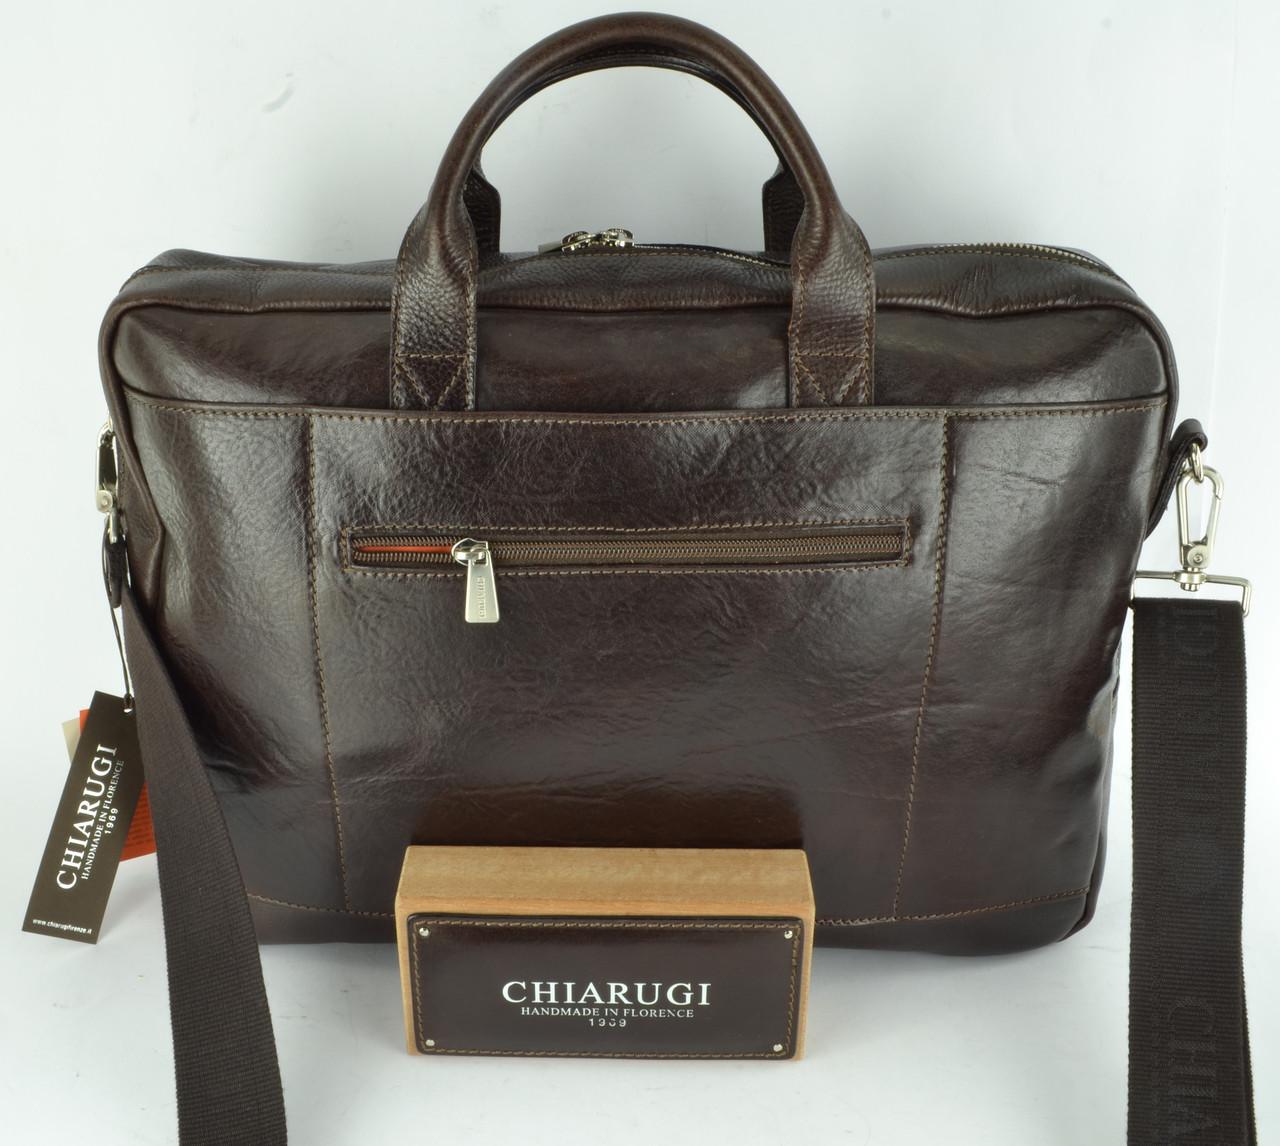 c98416646d74 Портфель-Сумка мужская Chiarugi (Чиаруджи) 94631: продажа, цена в ...